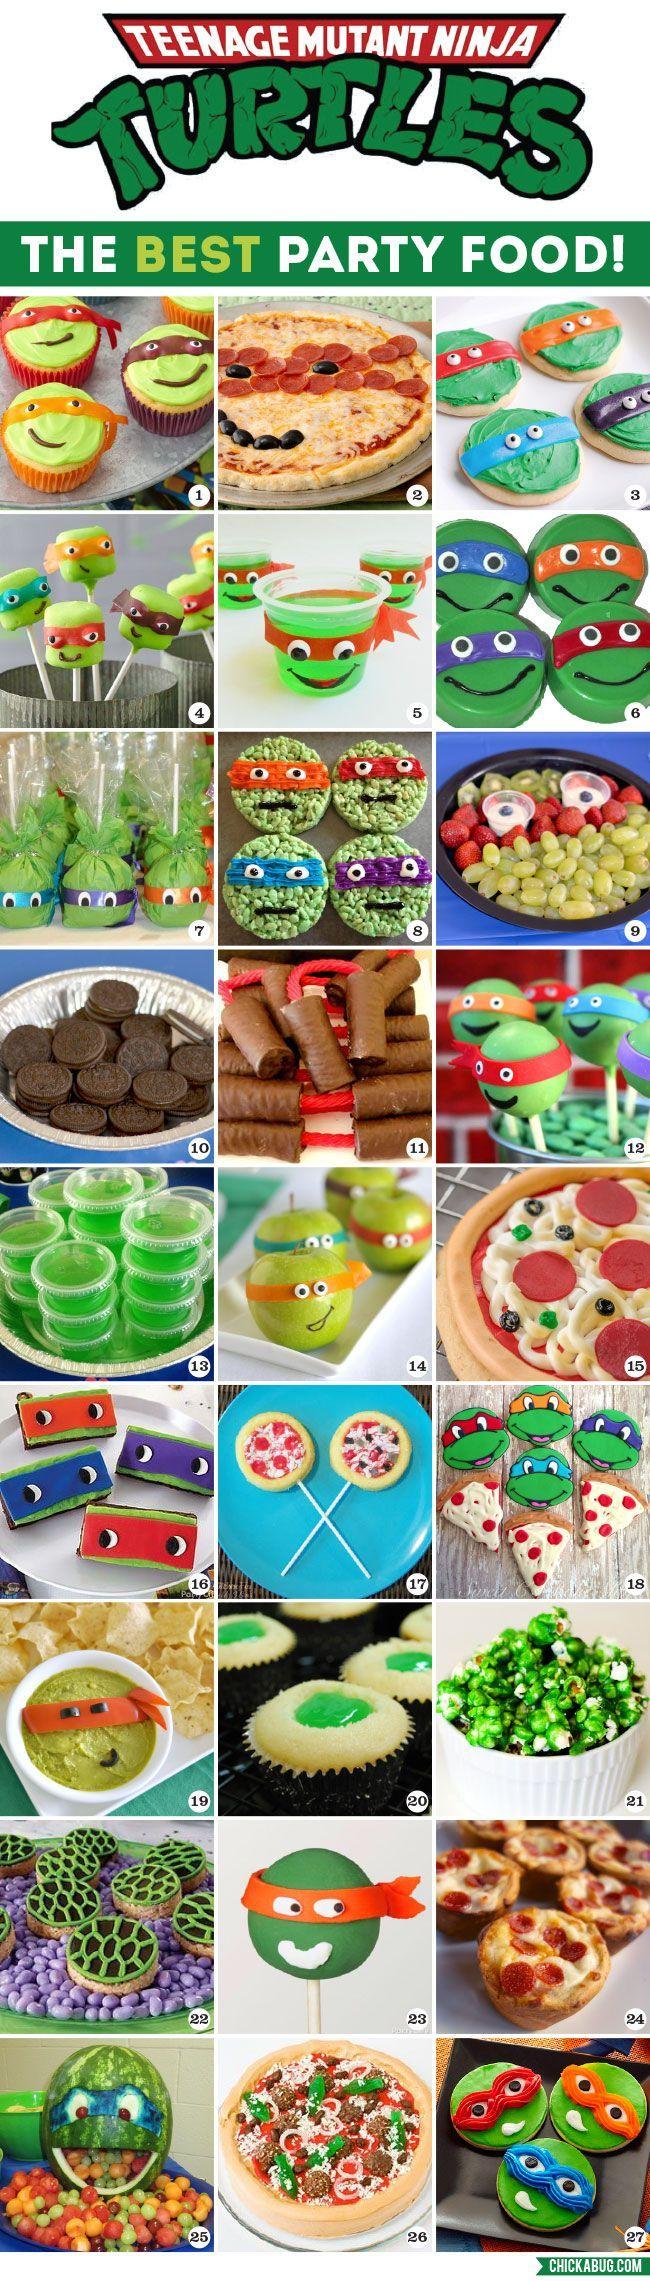 The Best Tmnt Party Food Chickabug Tmnt Party Food Ninja Turtles Birthday Party Ninja Turtle Party